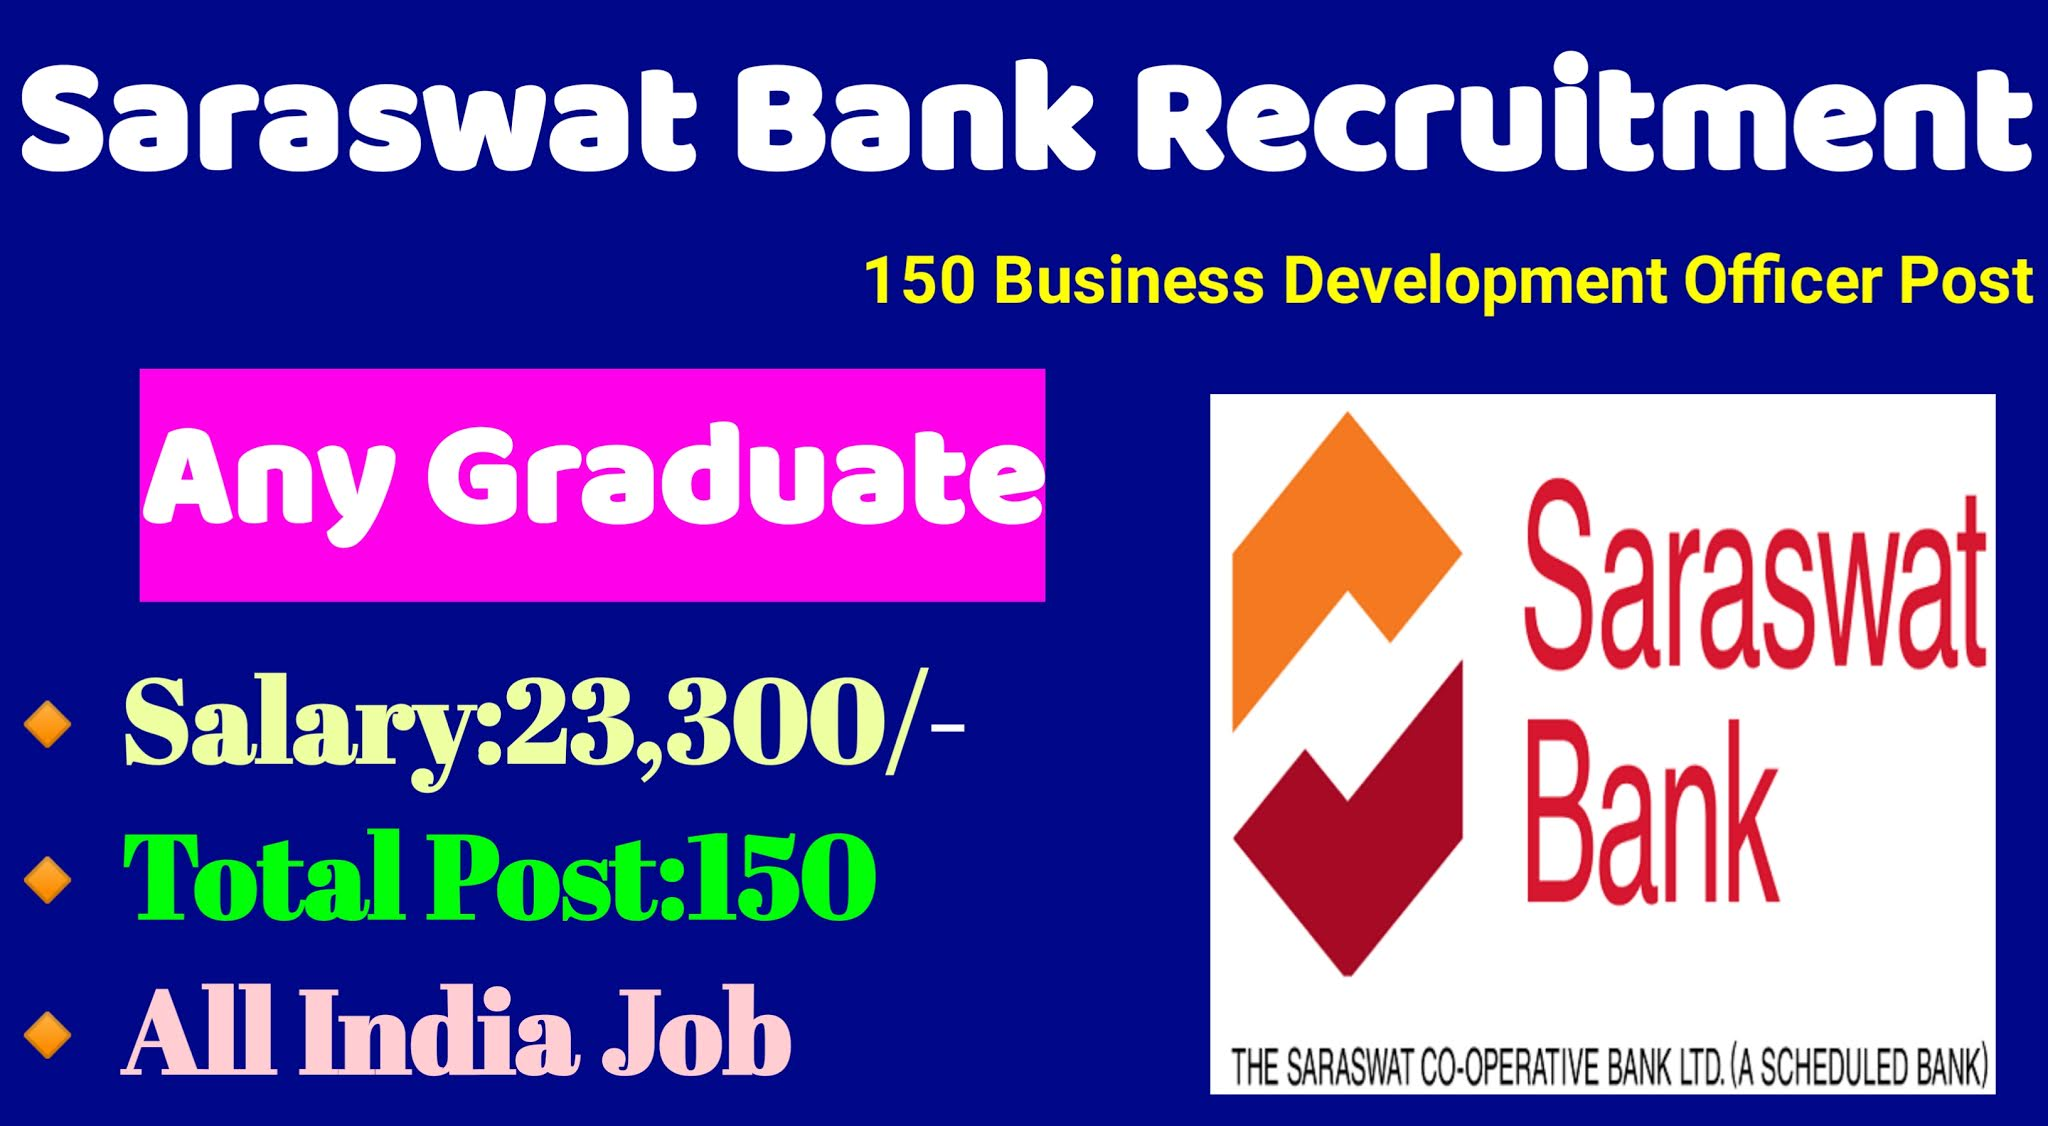 Saraswat bank recruitment, Saraswat bank recruitment 2021,bank jobs, saraswat bank recruitment apply online, saraswat bank vacancy 2021, saraswat bank,saraswat bank recruitment salary,saraswat bank recruitment notification